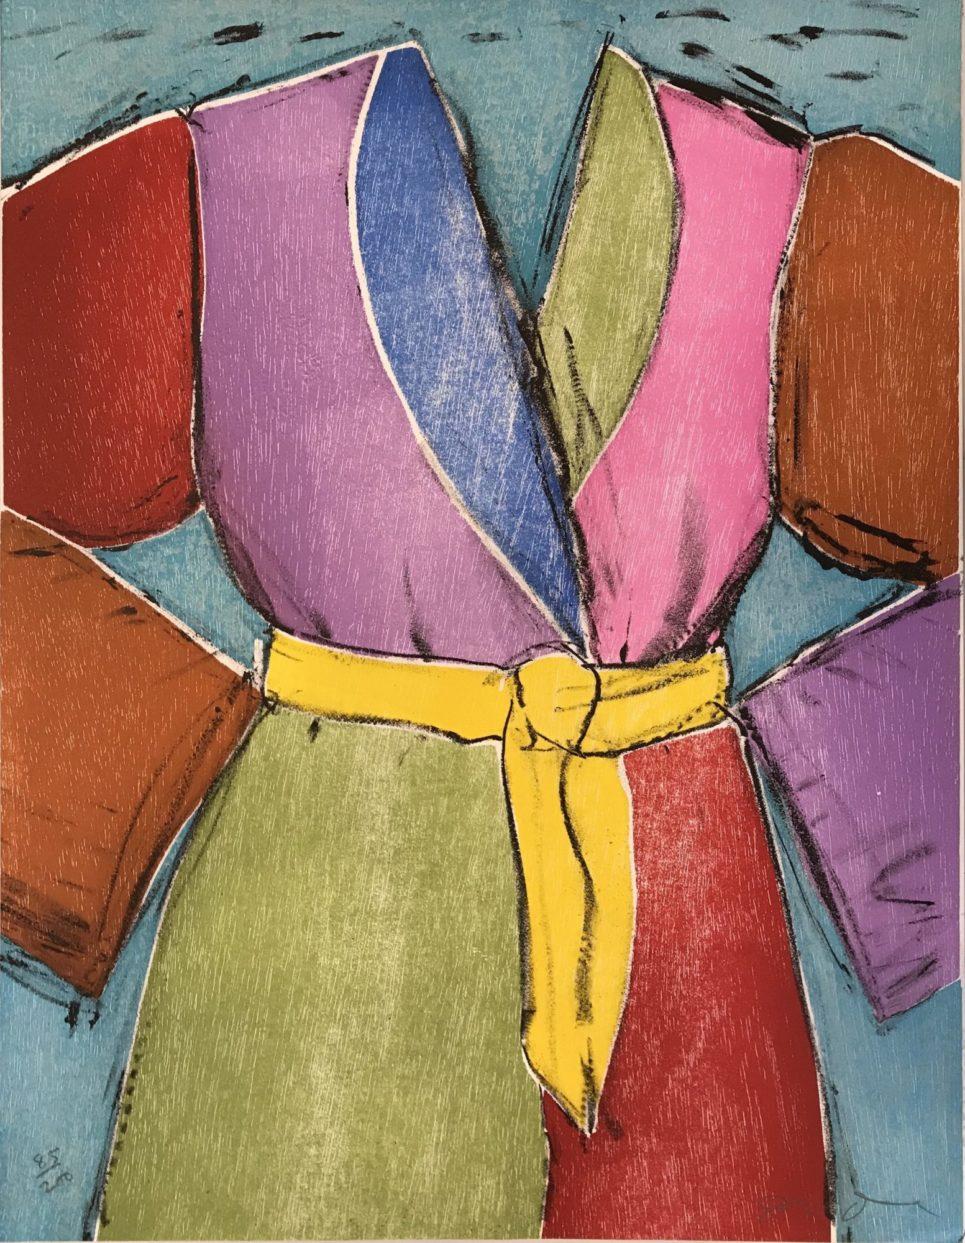 Jim Dine - The Yellow Belt